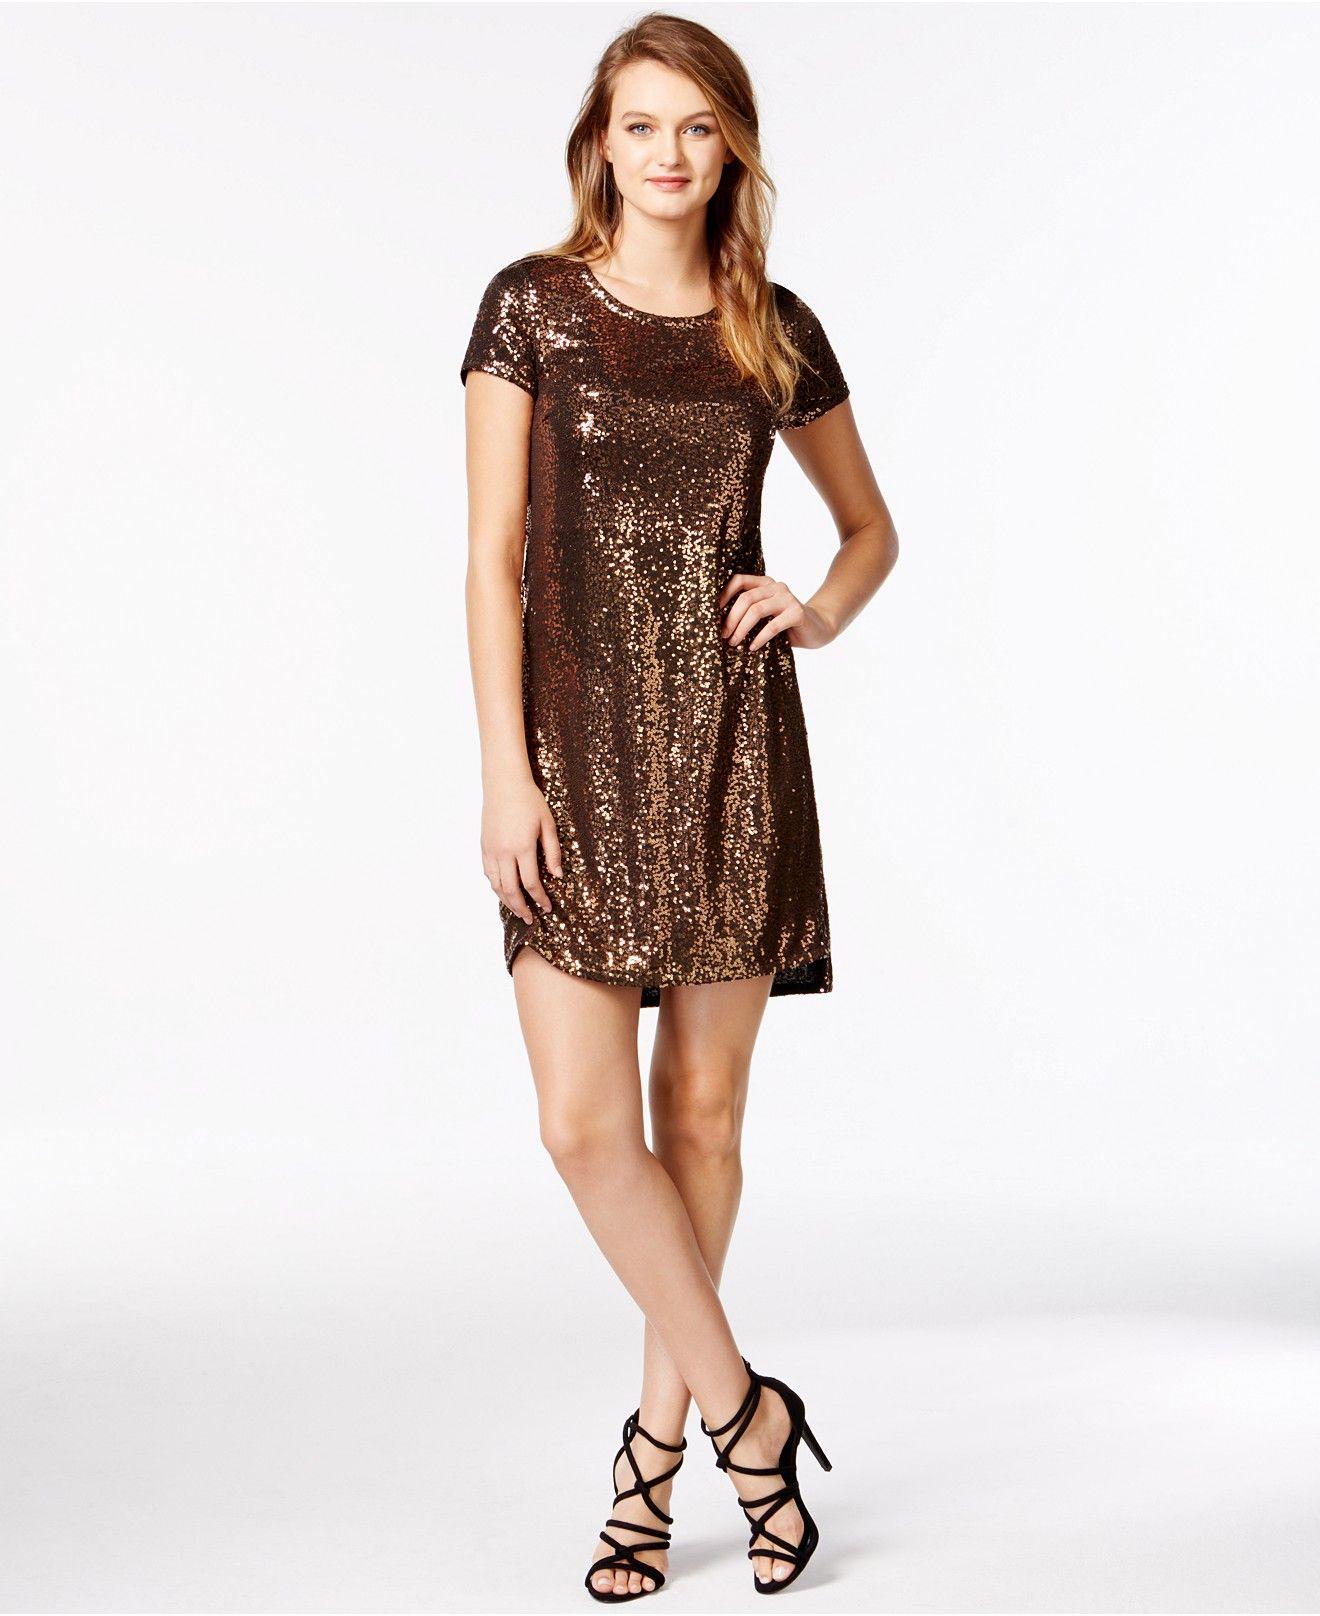 505cd16be1 Macys White Party Dress